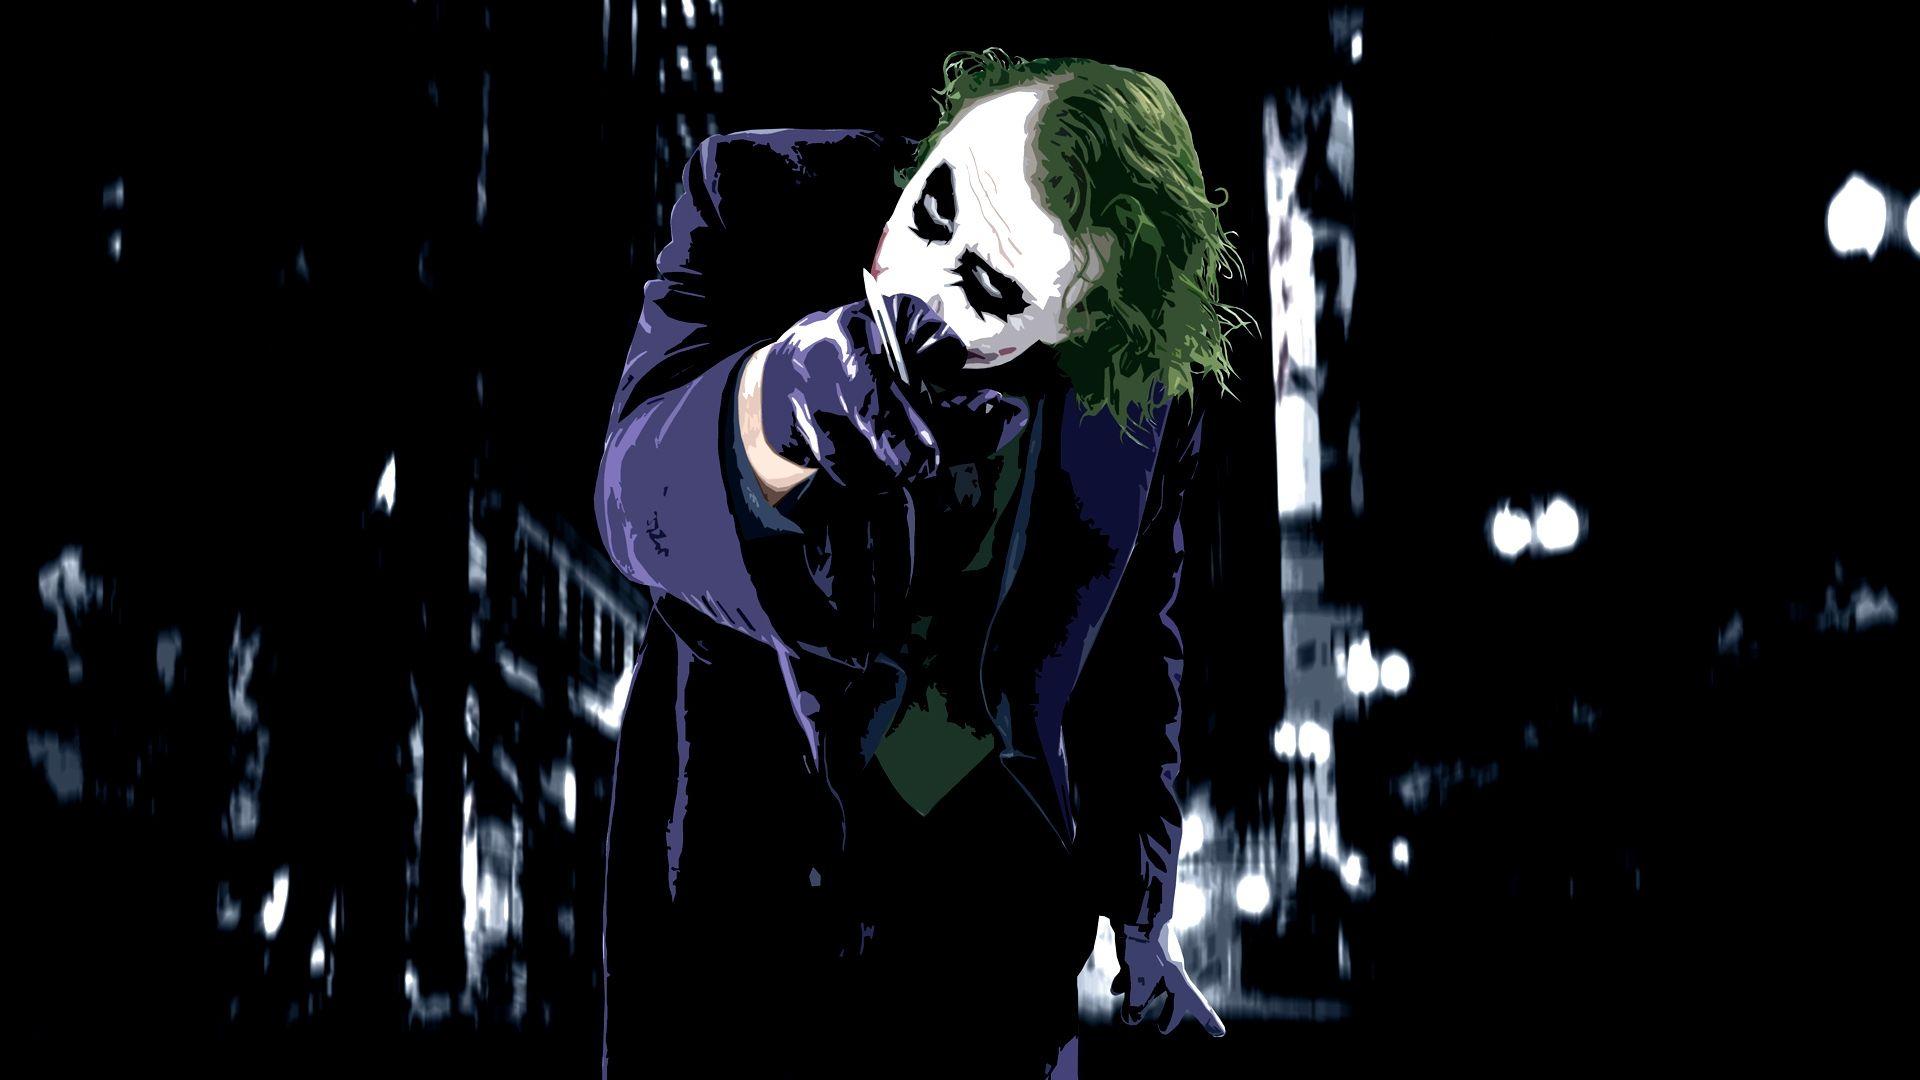 Download Wallpaper 1920x1080 Joker Card Vector Full Hd 1080p Hd Background Joker Hd Wallpaper Joker Wallpapers Joker Images